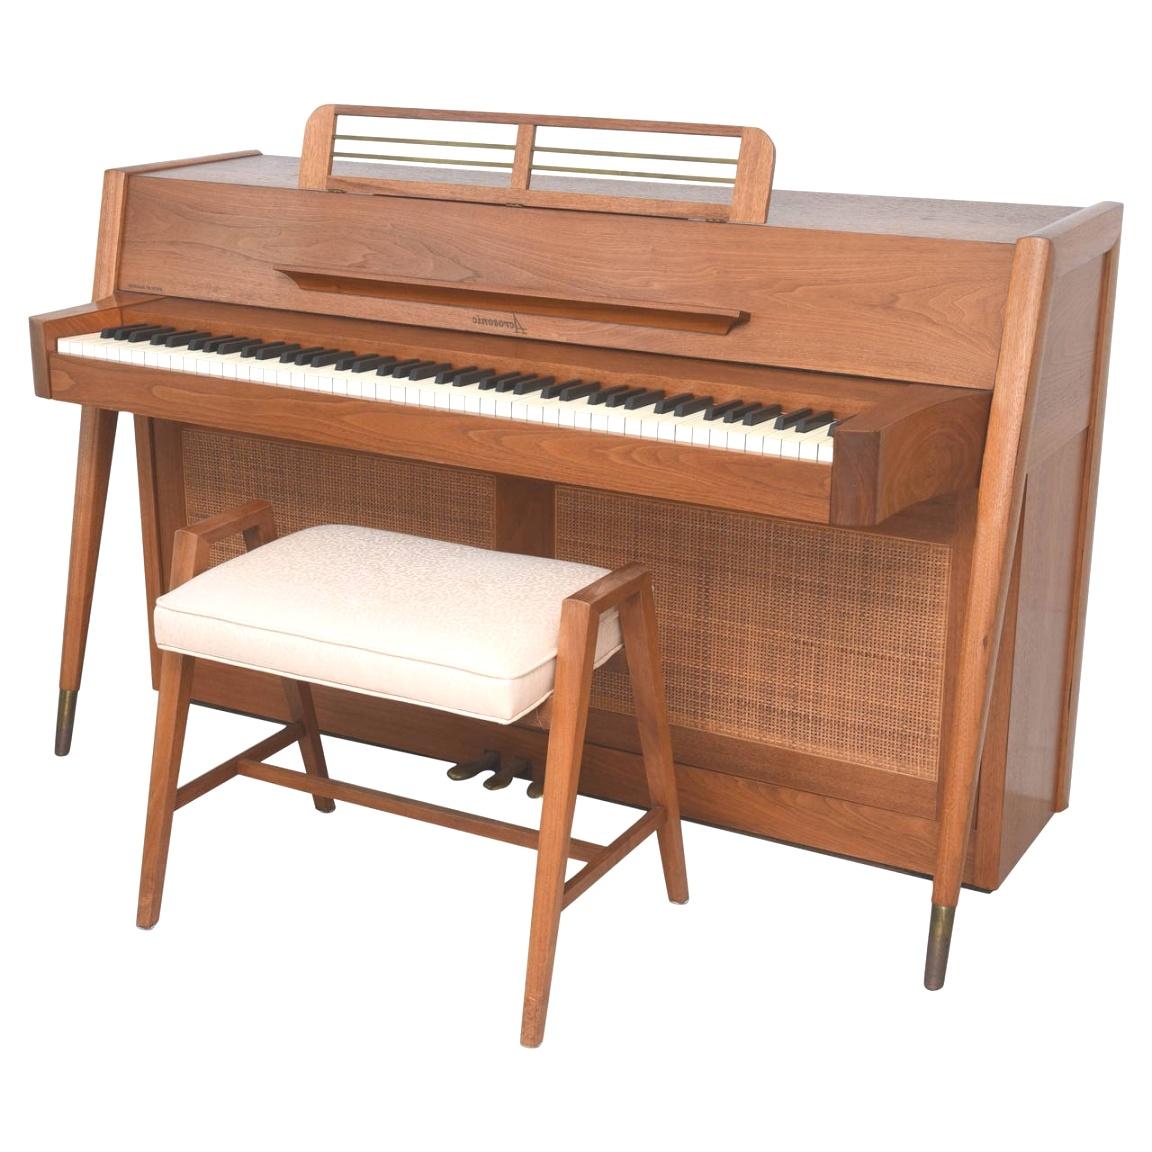 mid century modern piano | Mid-Century Modern Arcosonic Spinet Piano by Baldwin at 1stdibs | mid century modern piano